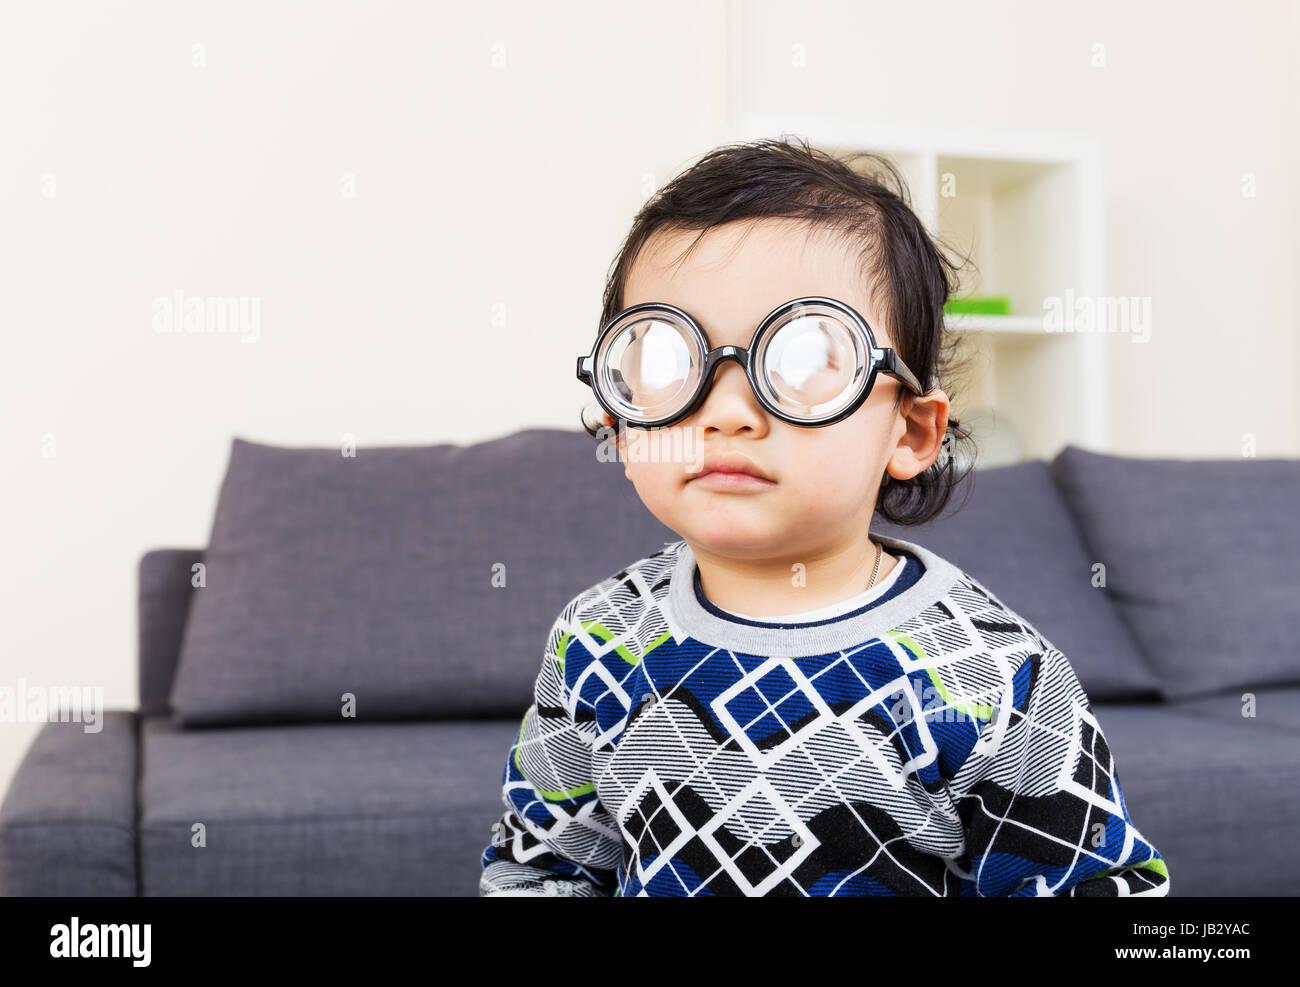 thick glasses stockfotos thick glasses bilder alamy. Black Bedroom Furniture Sets. Home Design Ideas